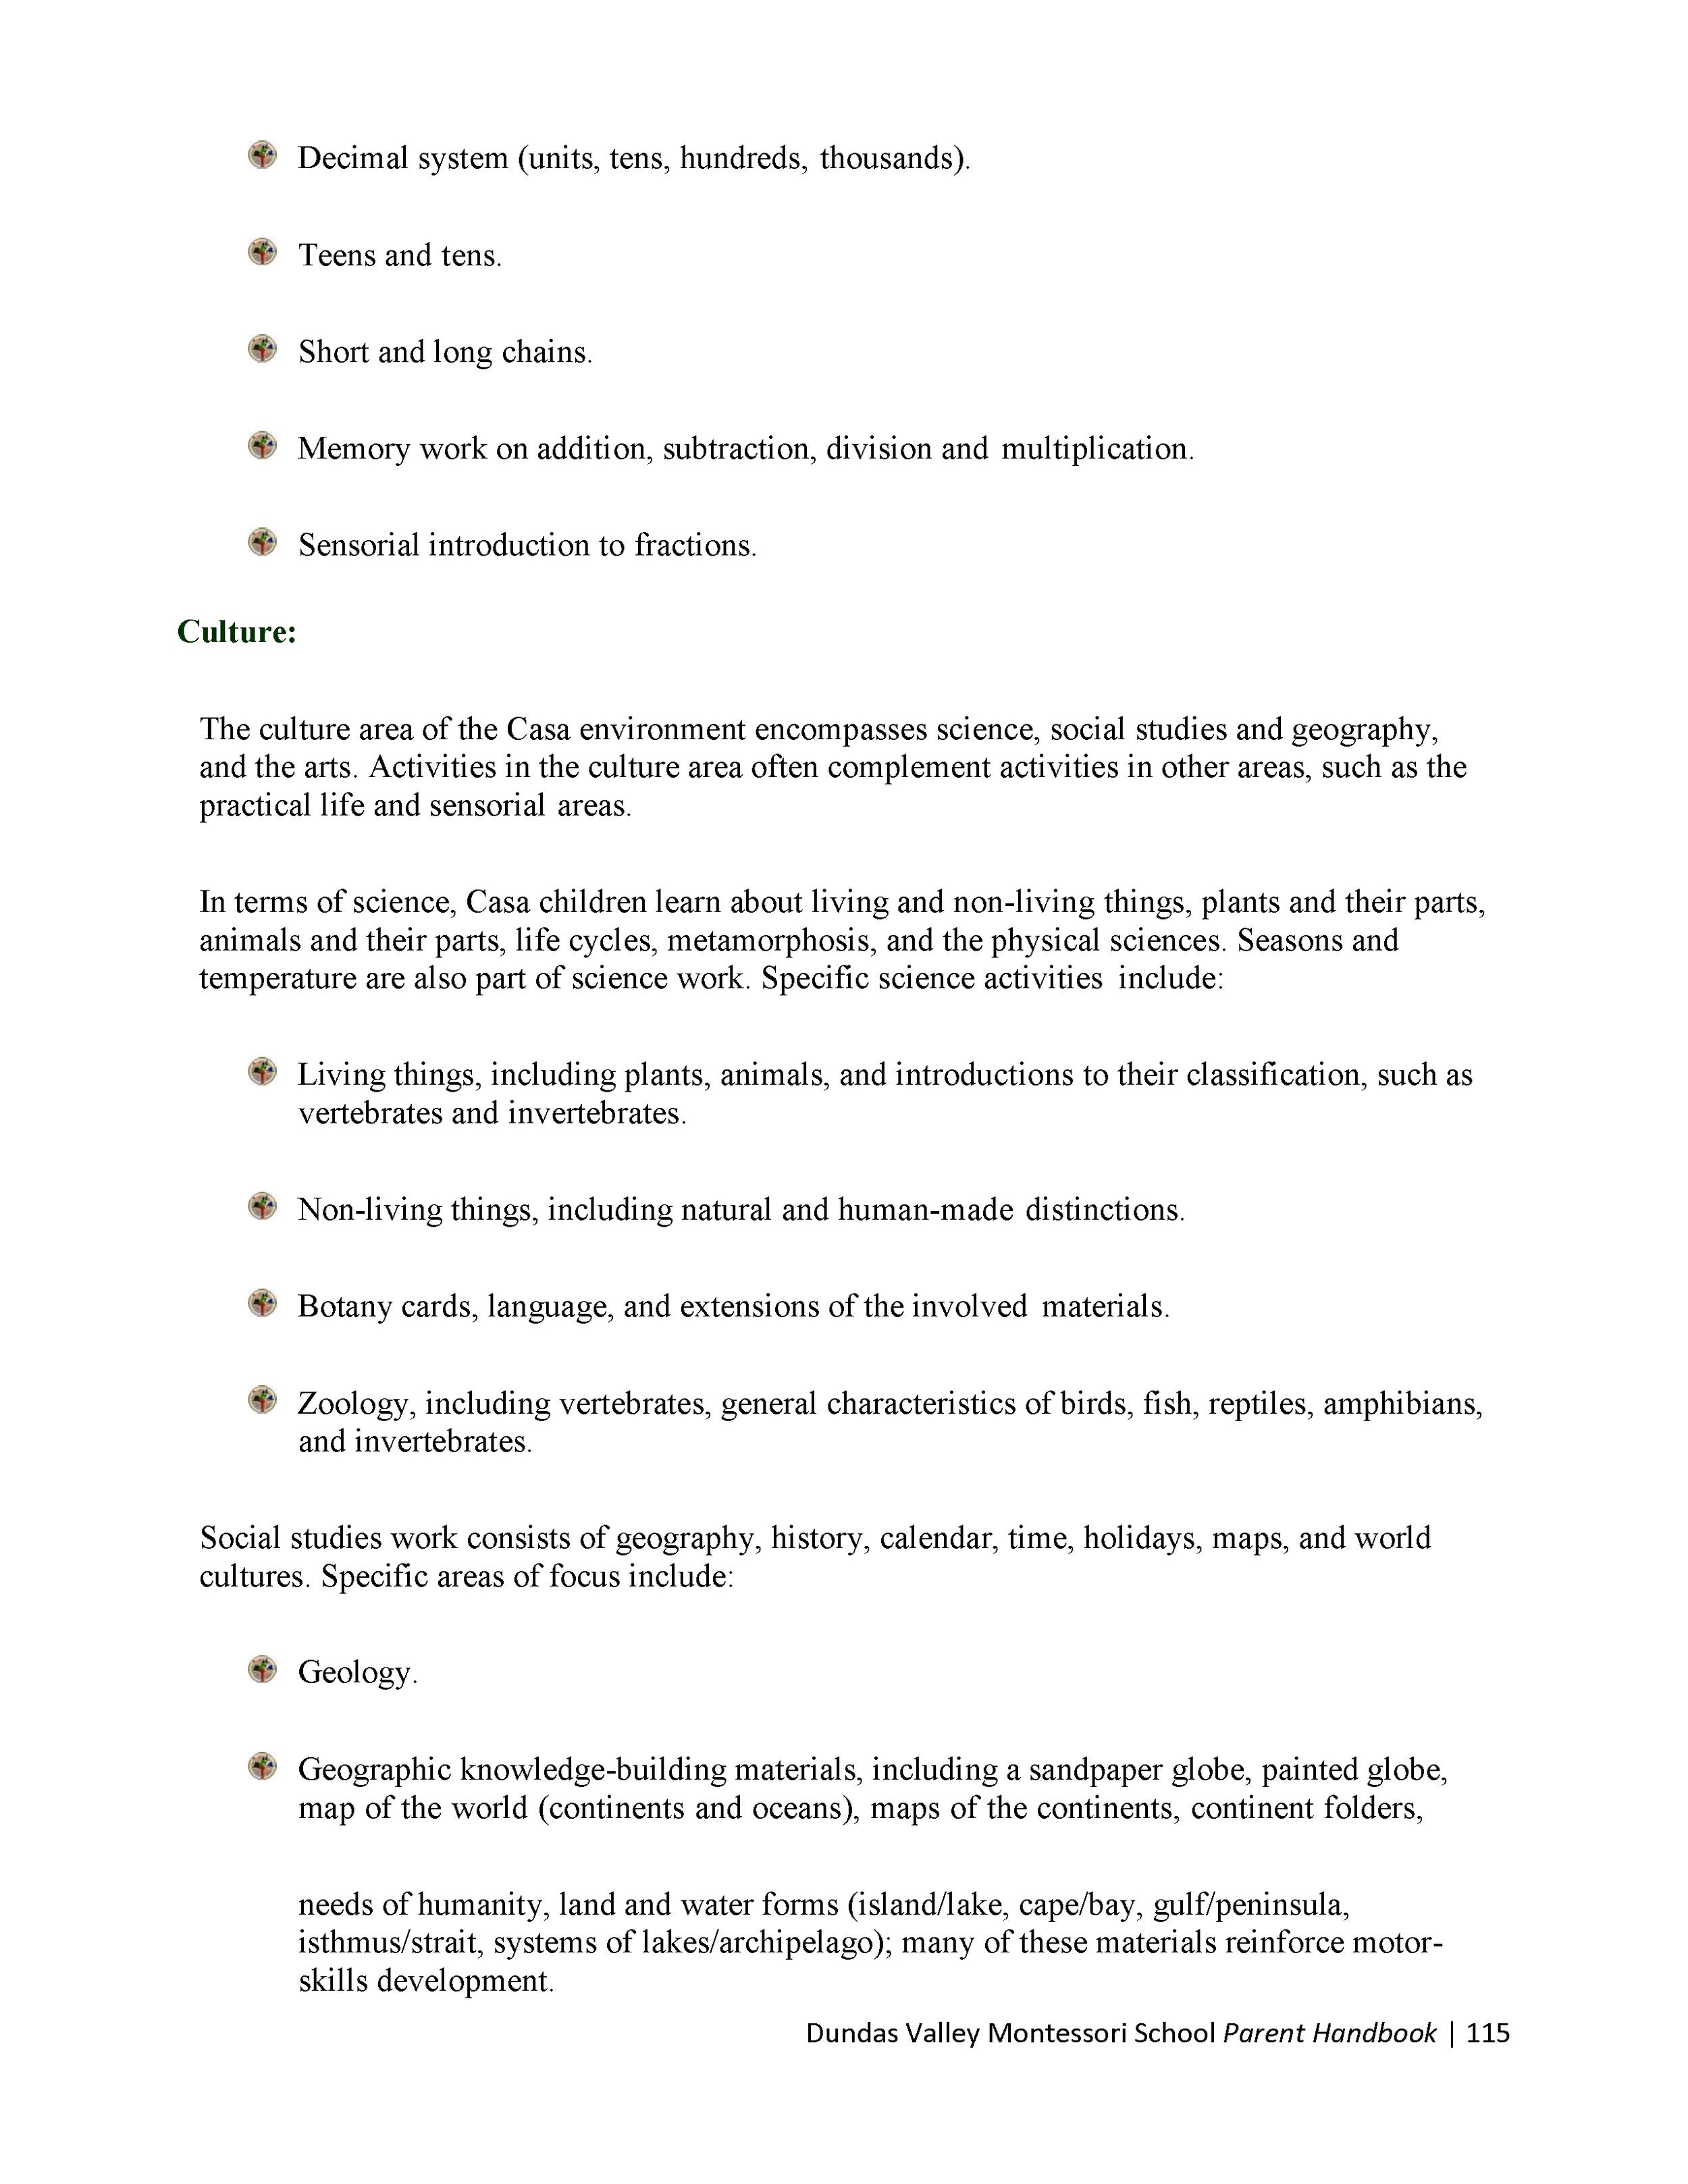 DVMS-Parent-Handbook-19-20_Page_117.png